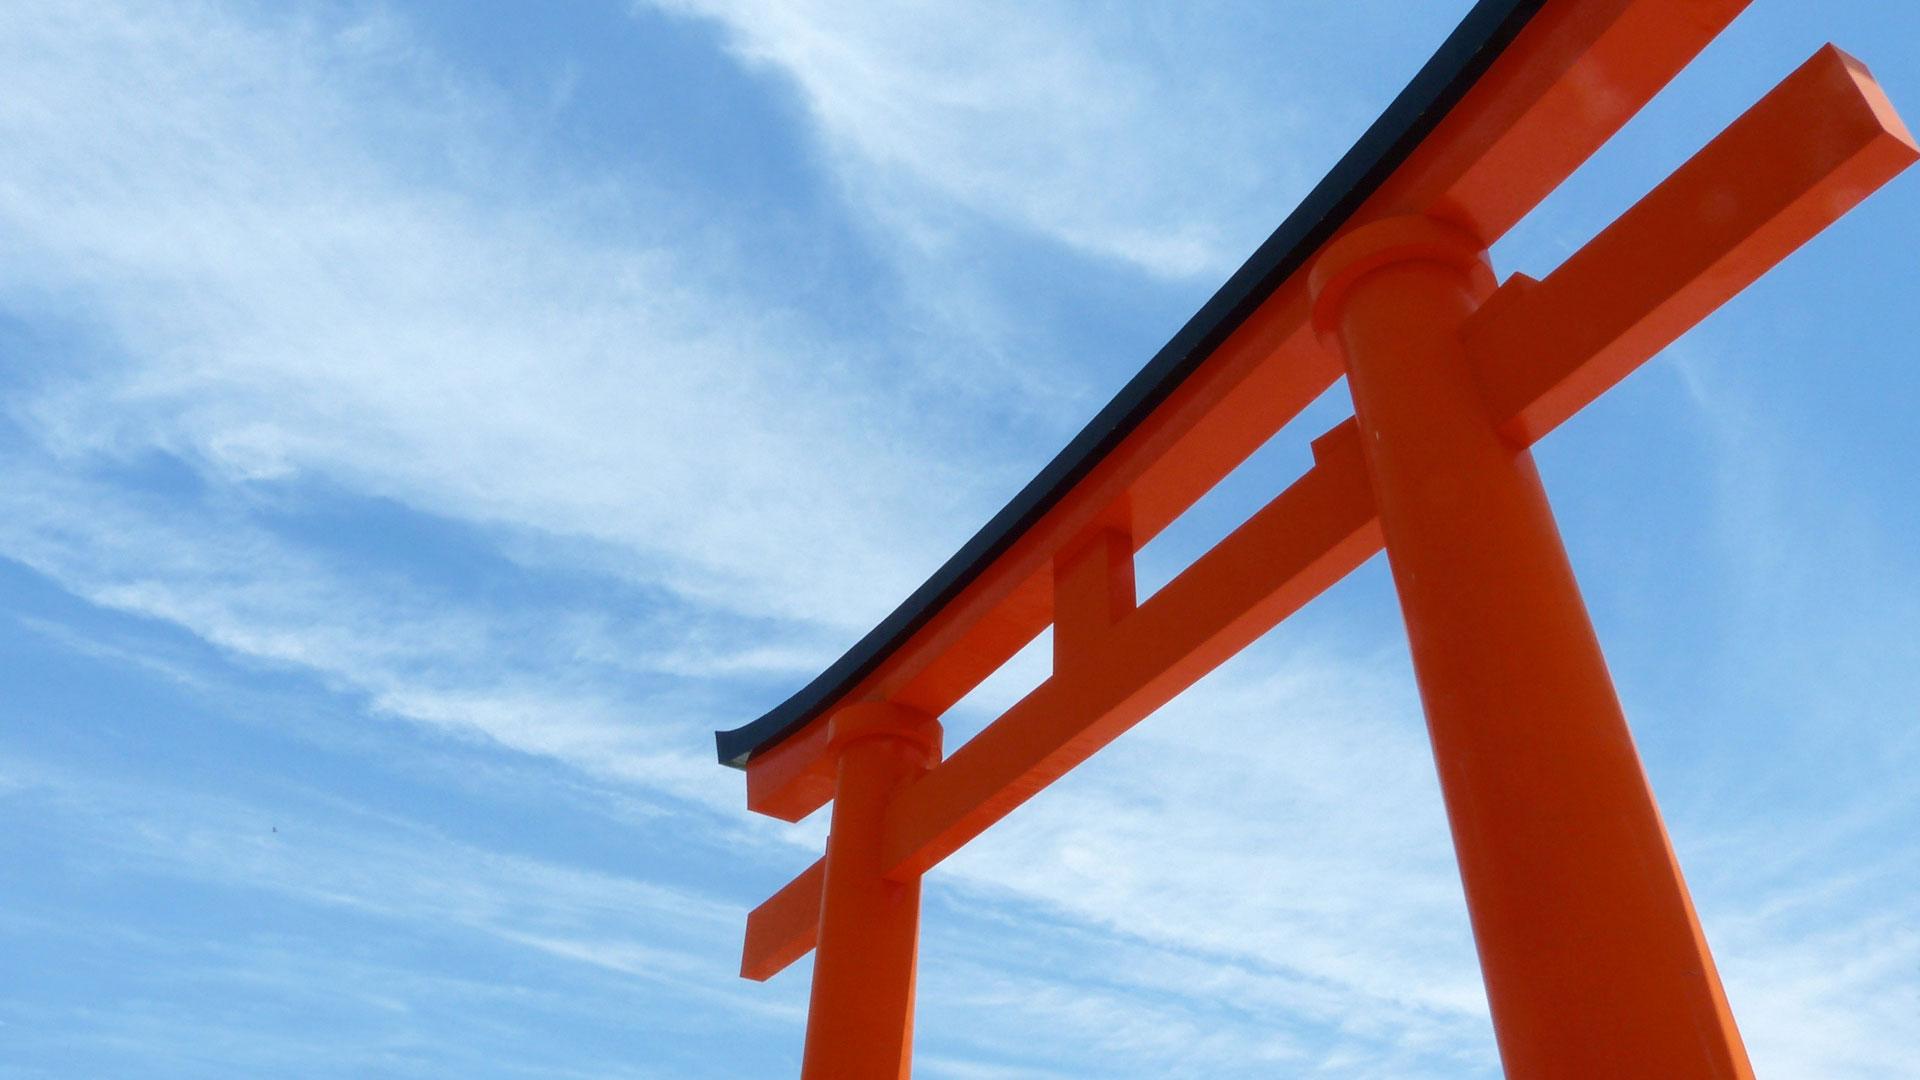 torii-kyoto-japan-shrine-kyoto-prefecture